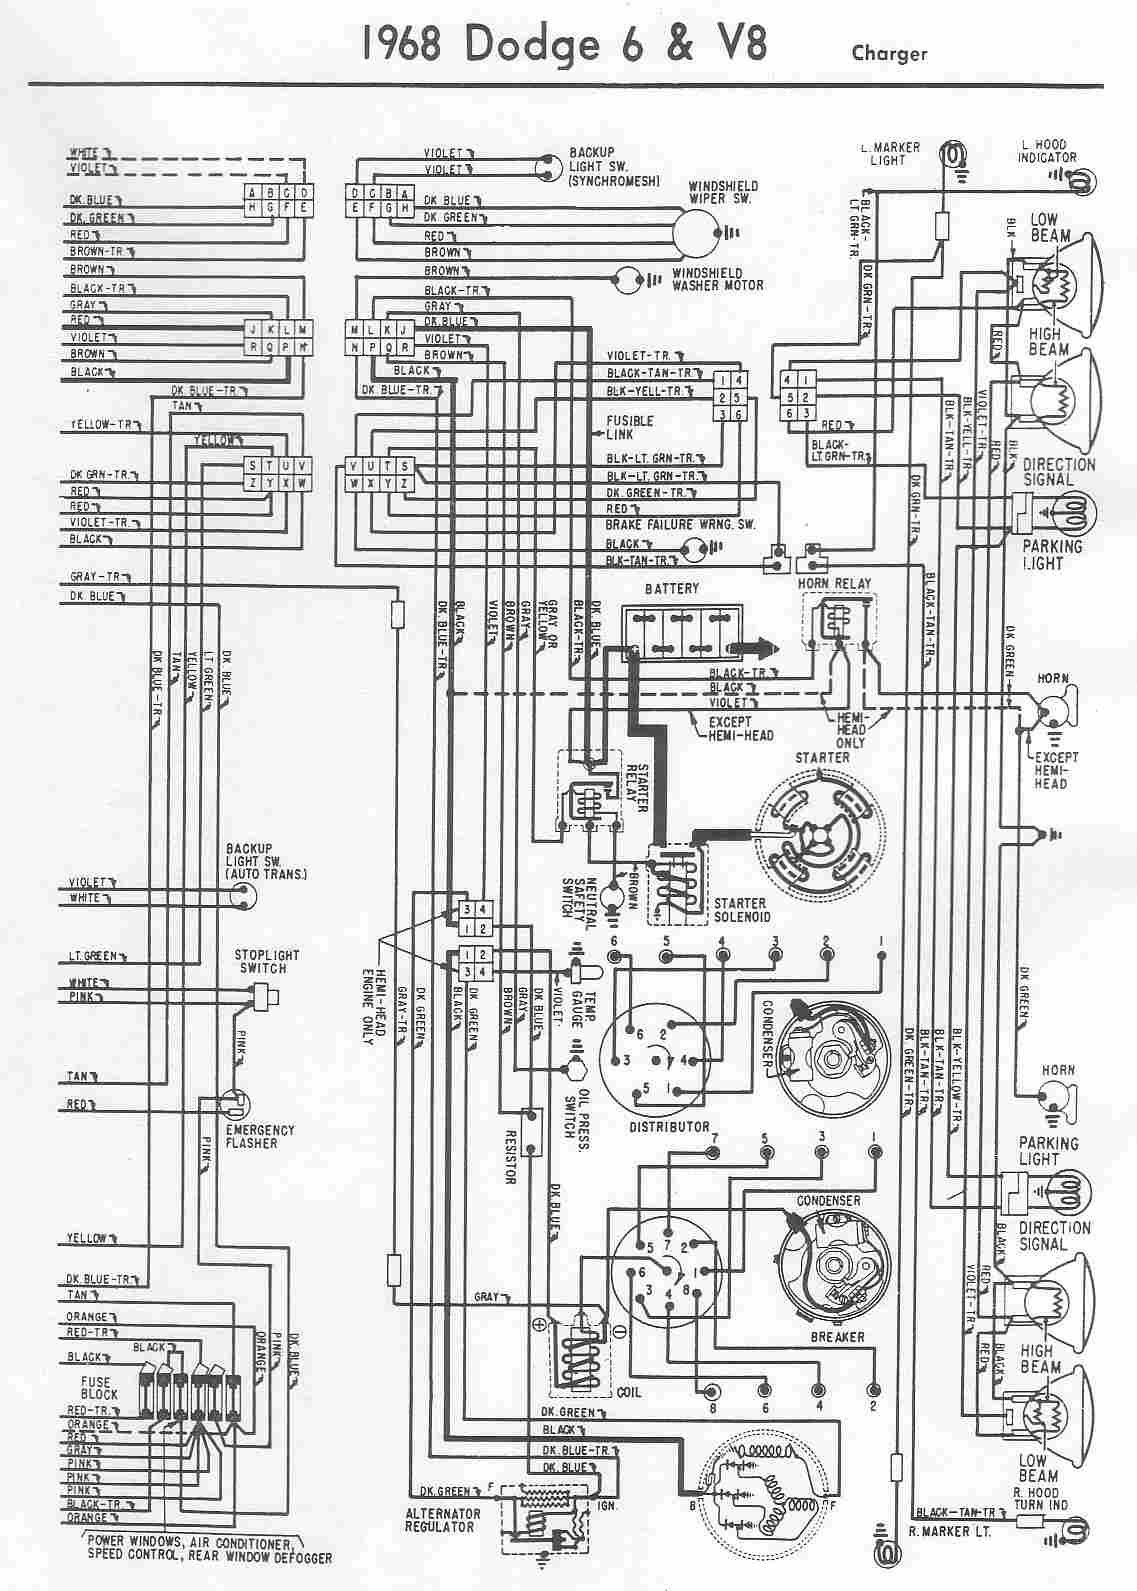 Chevy Corvette 1954 Wiring Diagrams By Danmarius1 Diagram 1967 Camaro Free Schematic Auto Electrical 1969 Delco Radio